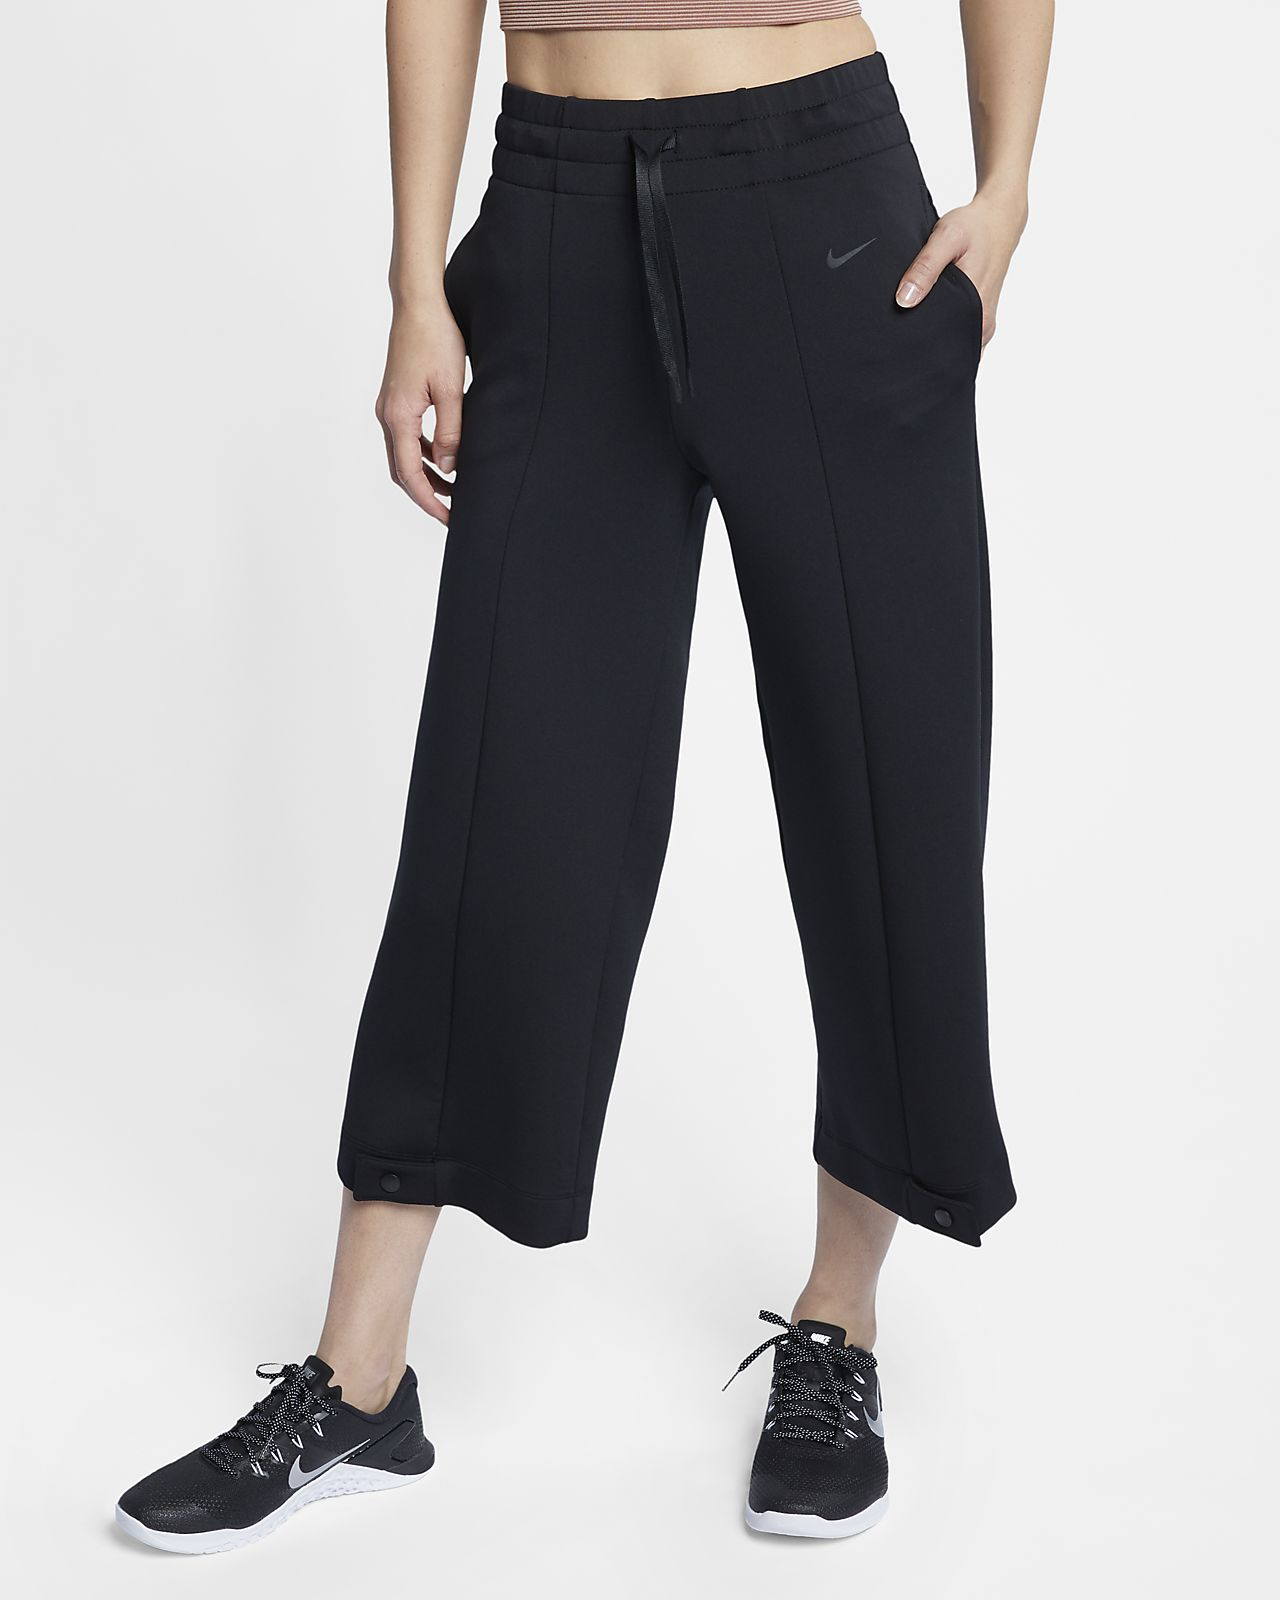 Pantaloni da training Nike Dri-FIT - Donna